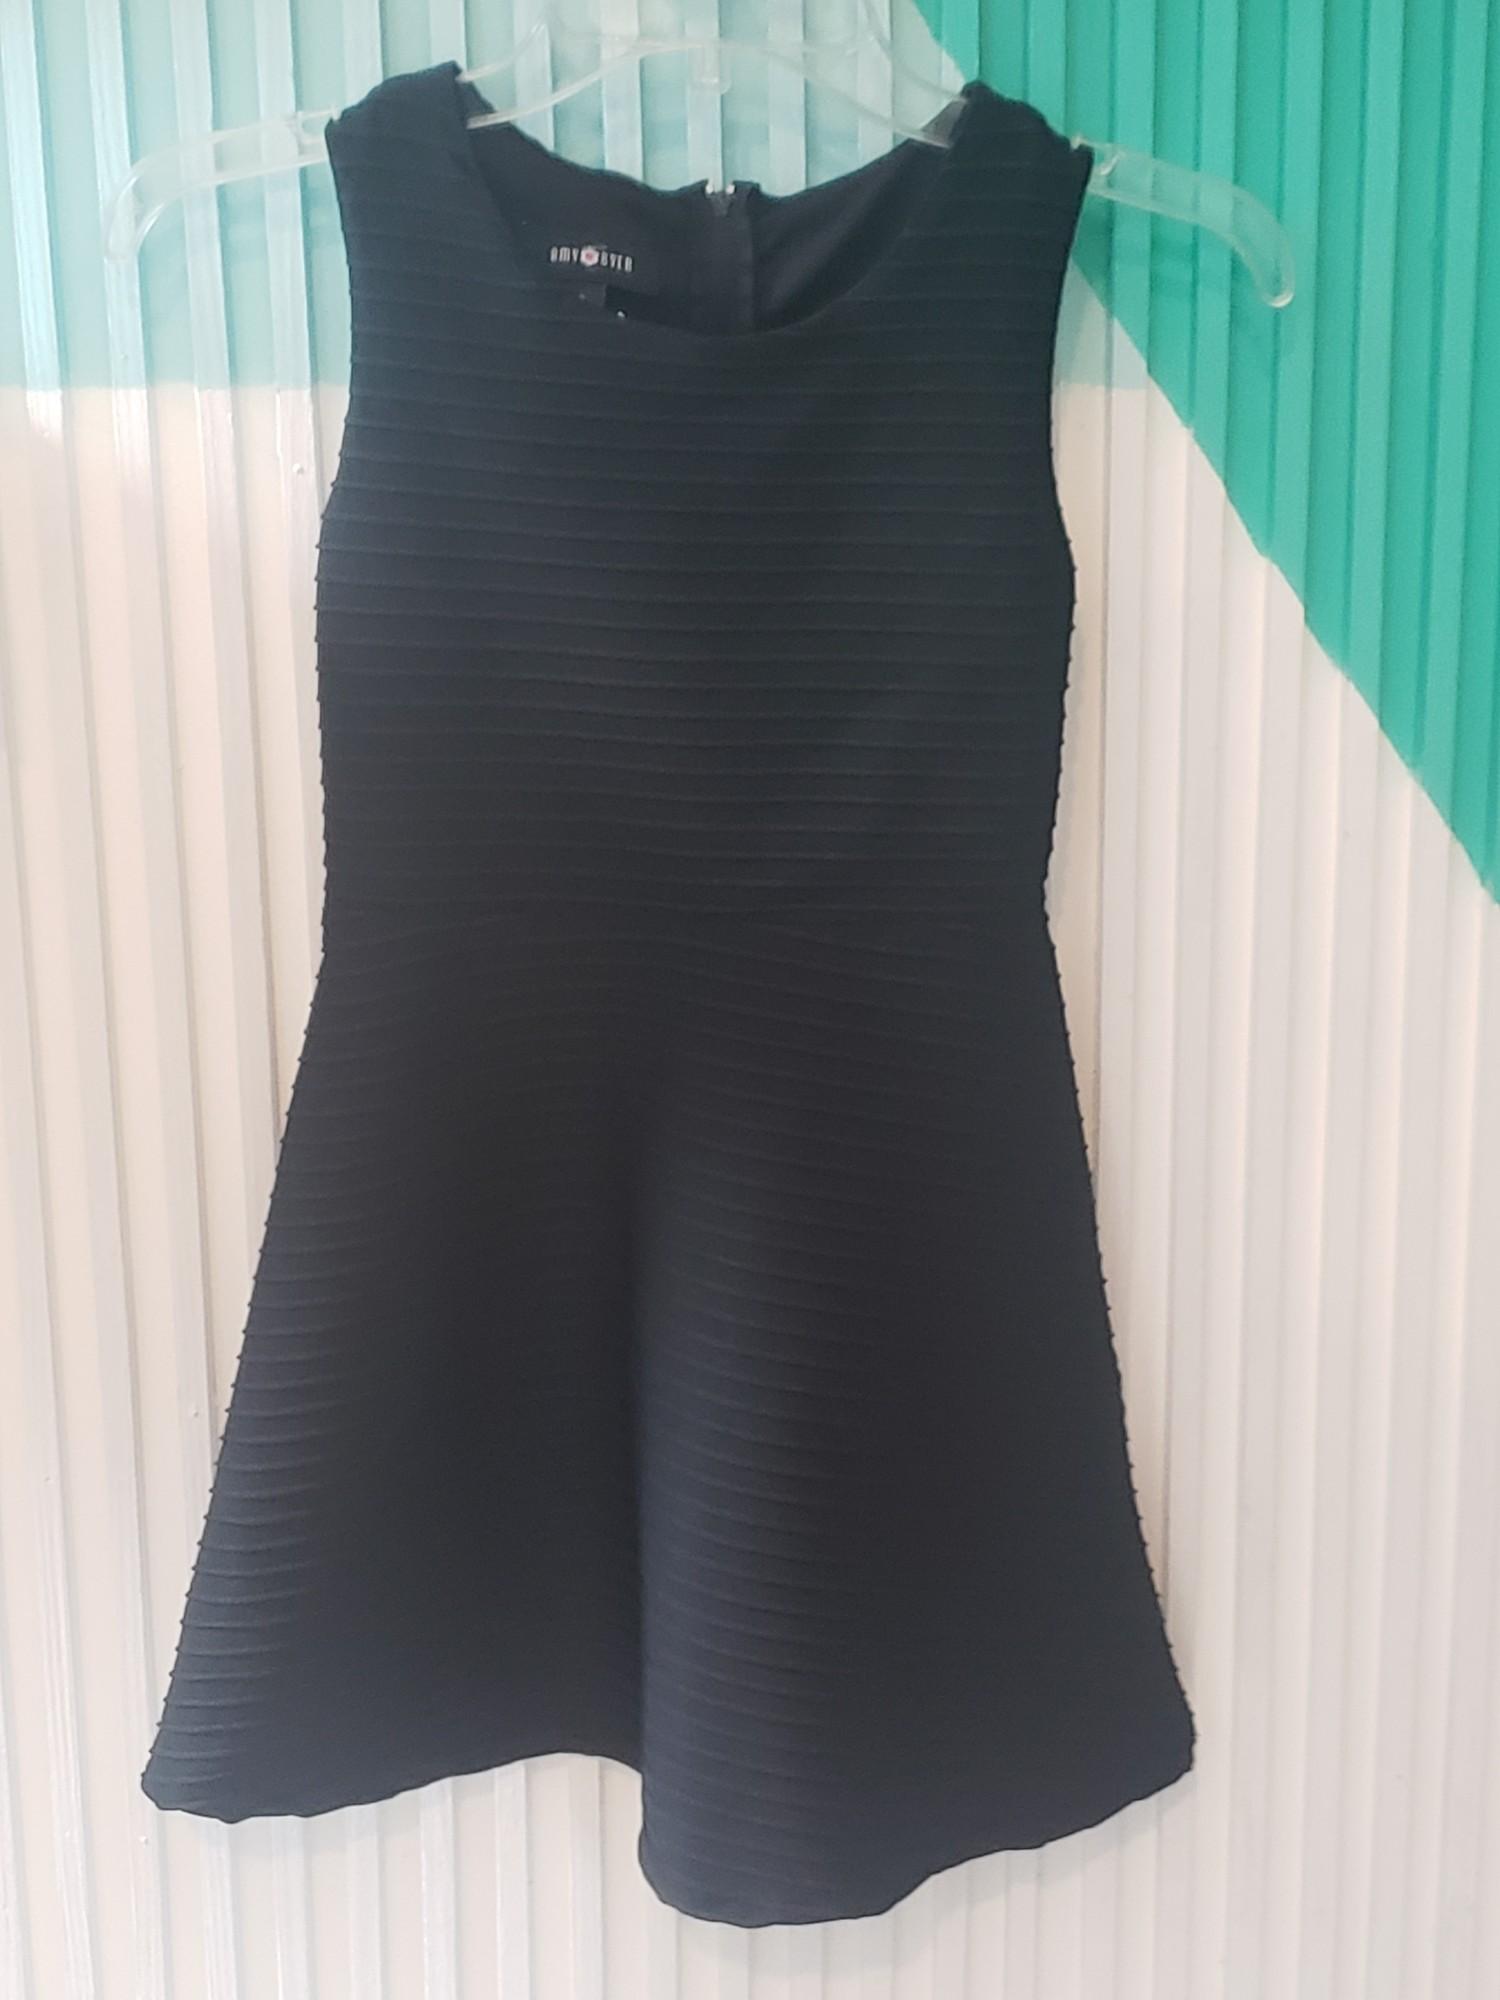 Amy Byer Dress, Black, Size: 8